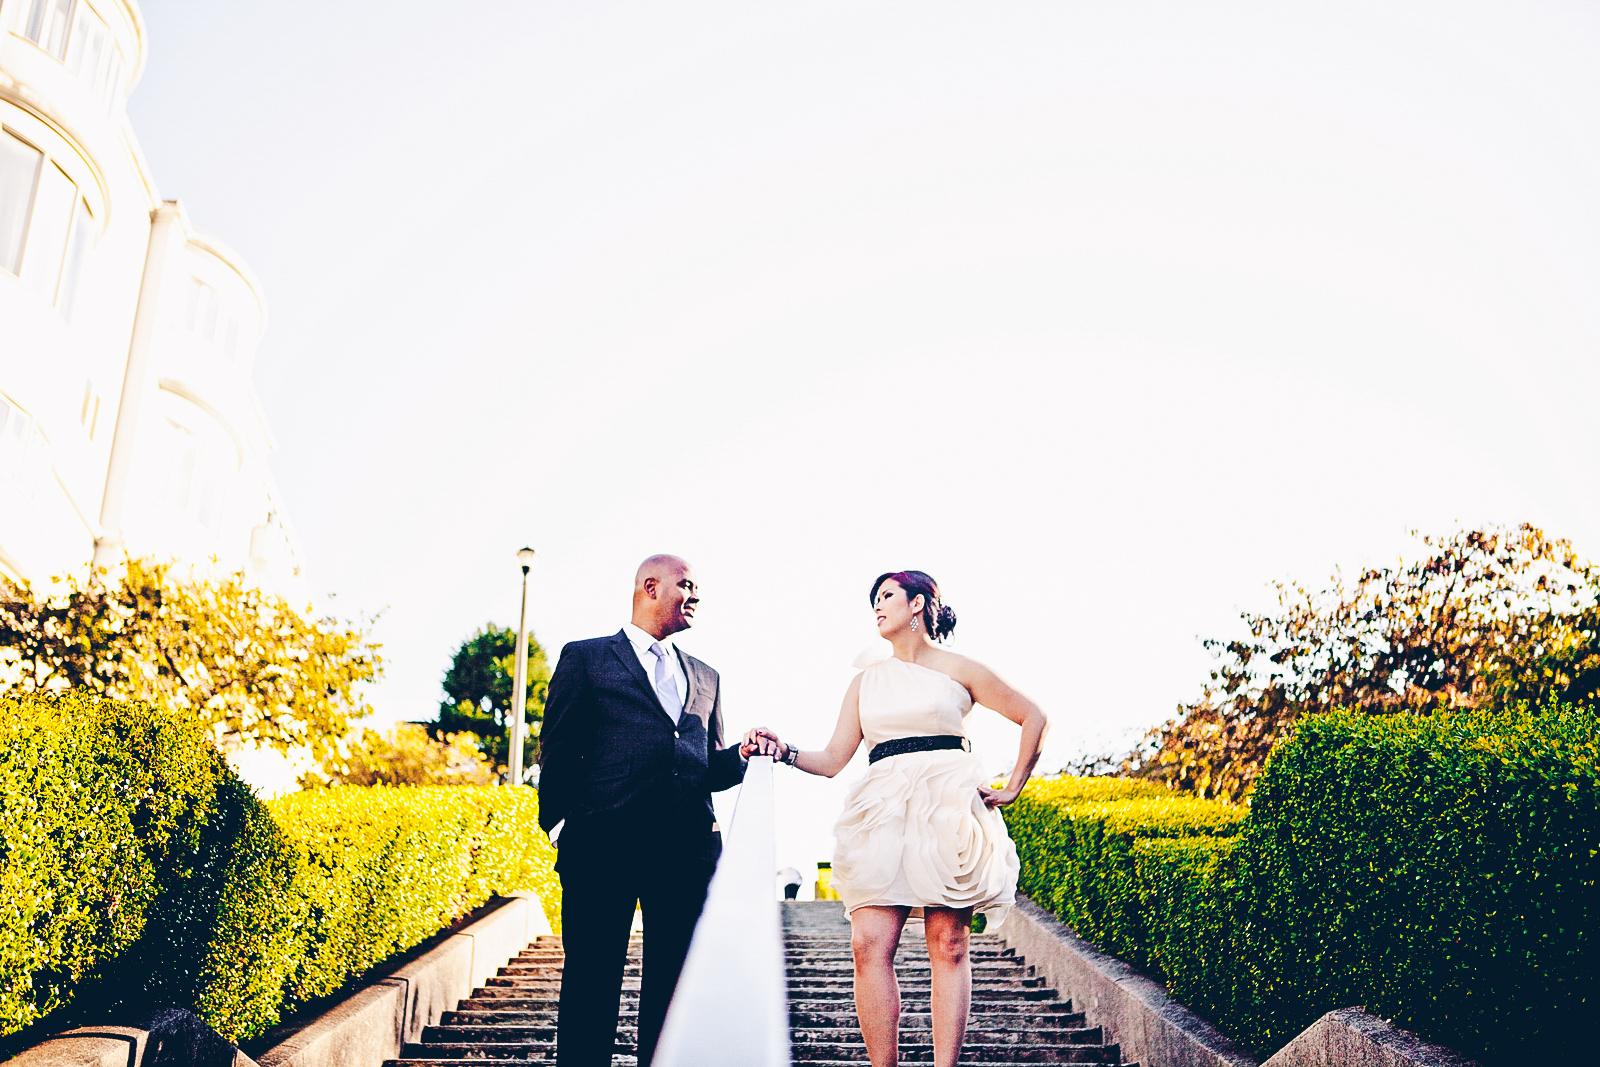 greens_restaurant_wedding_photography_san_franscisco_ebony_siovhan_bokeh_photography_26.jpg